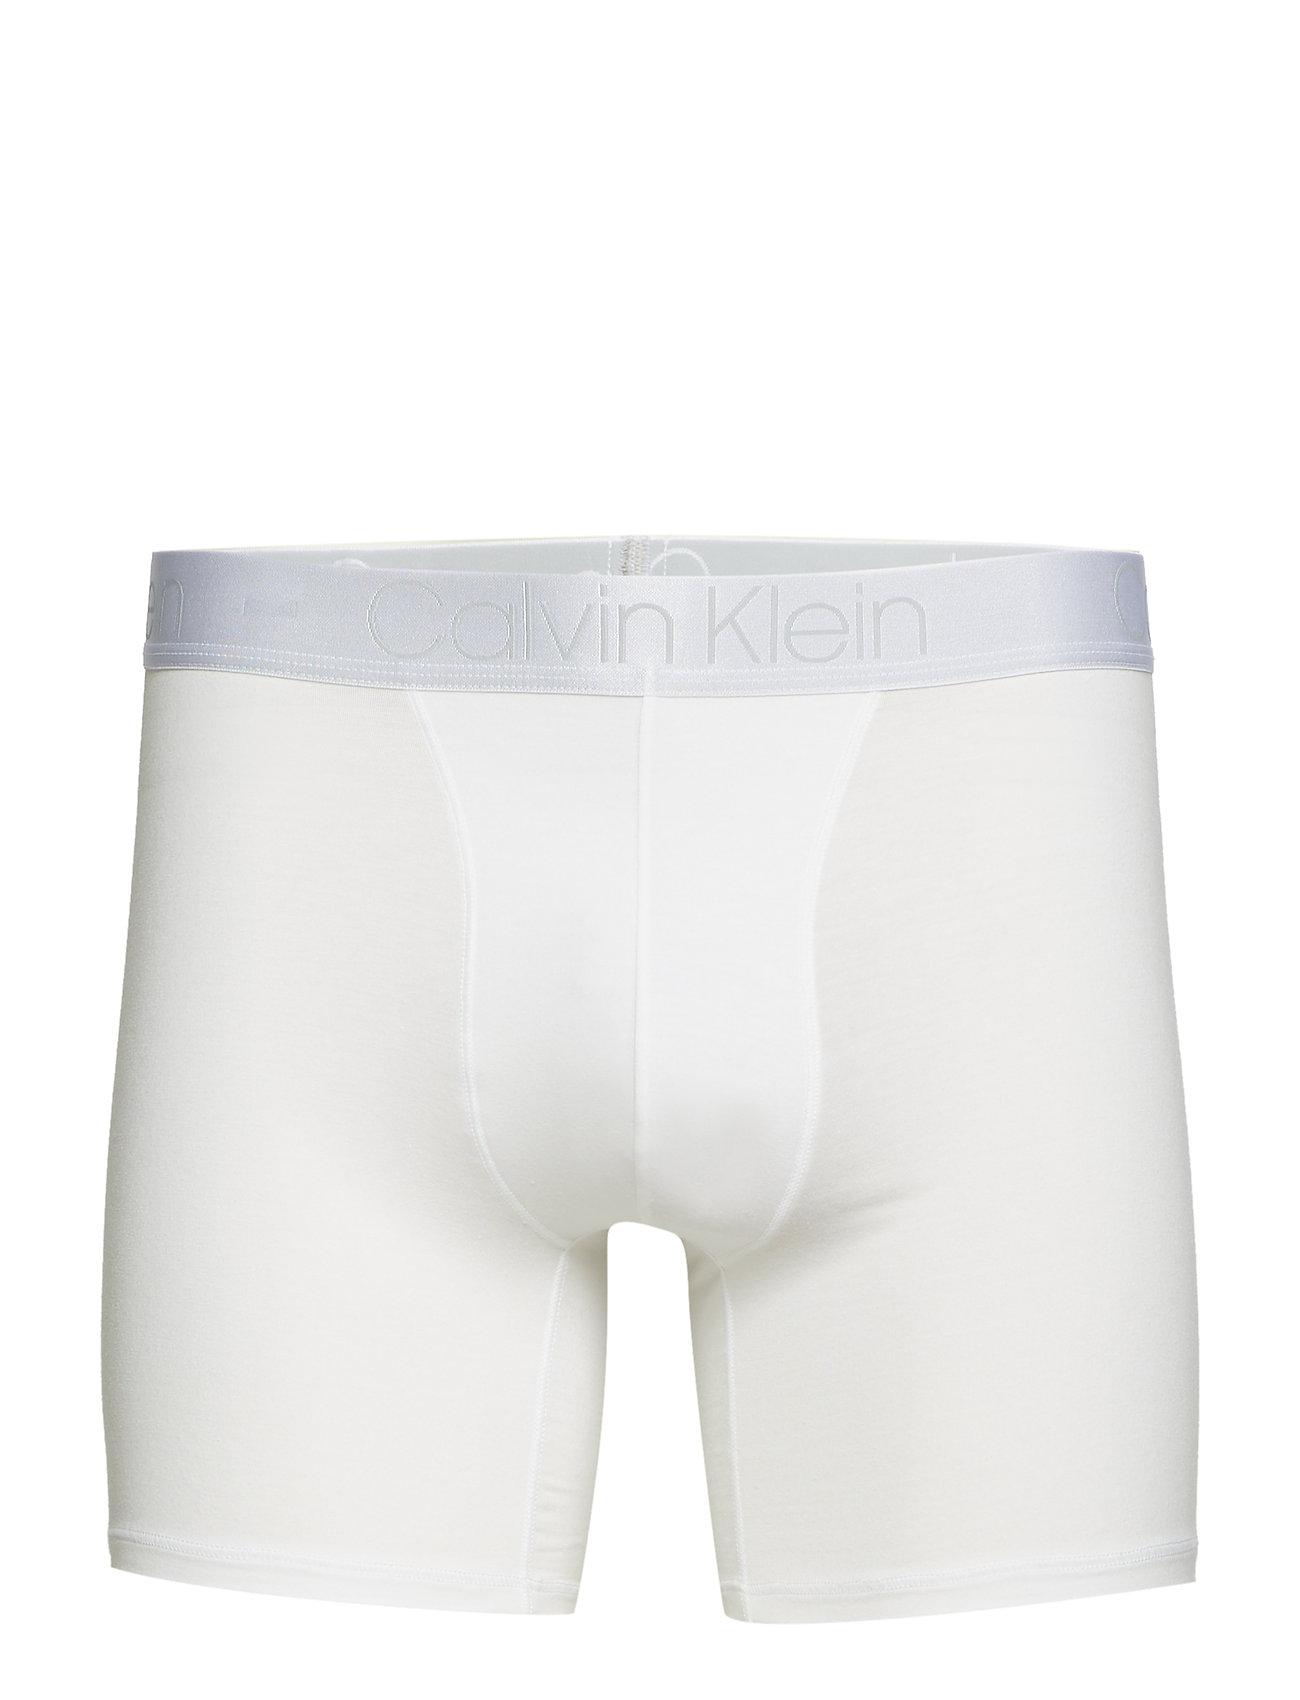 Calvin Klein BOXER BRIEF - WHITE